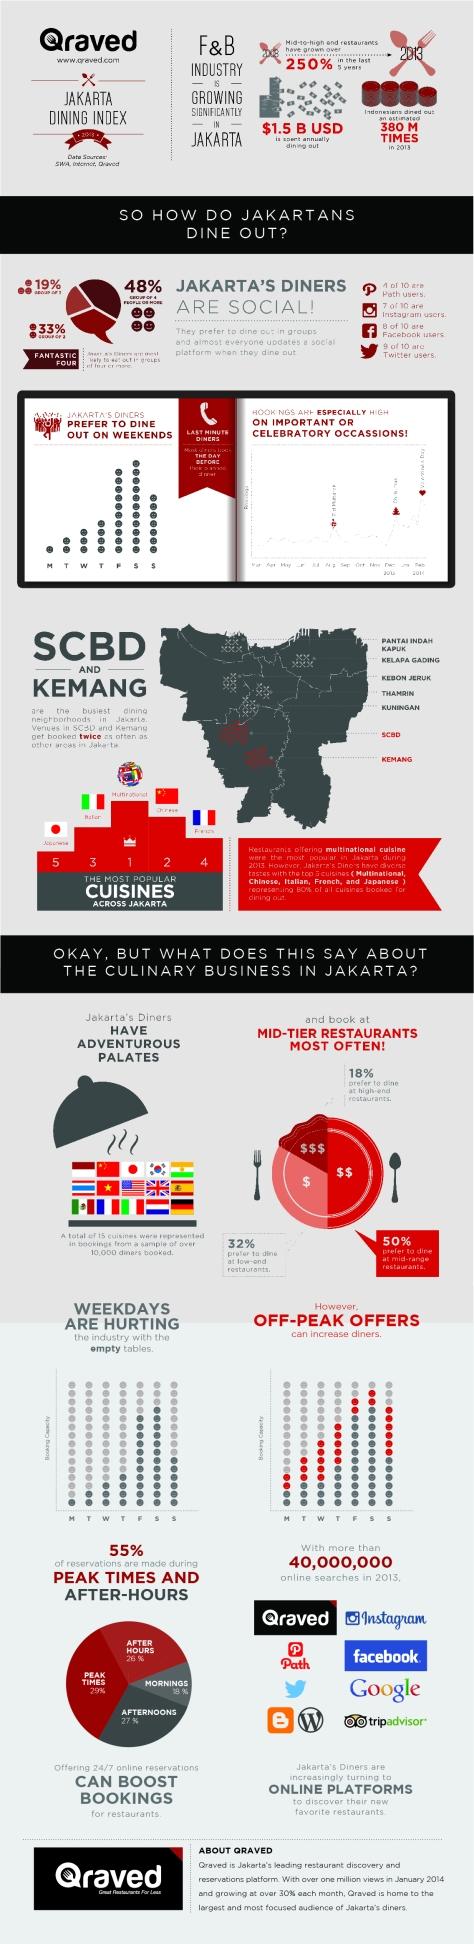 Qraved Jakarta Dining Index 2013